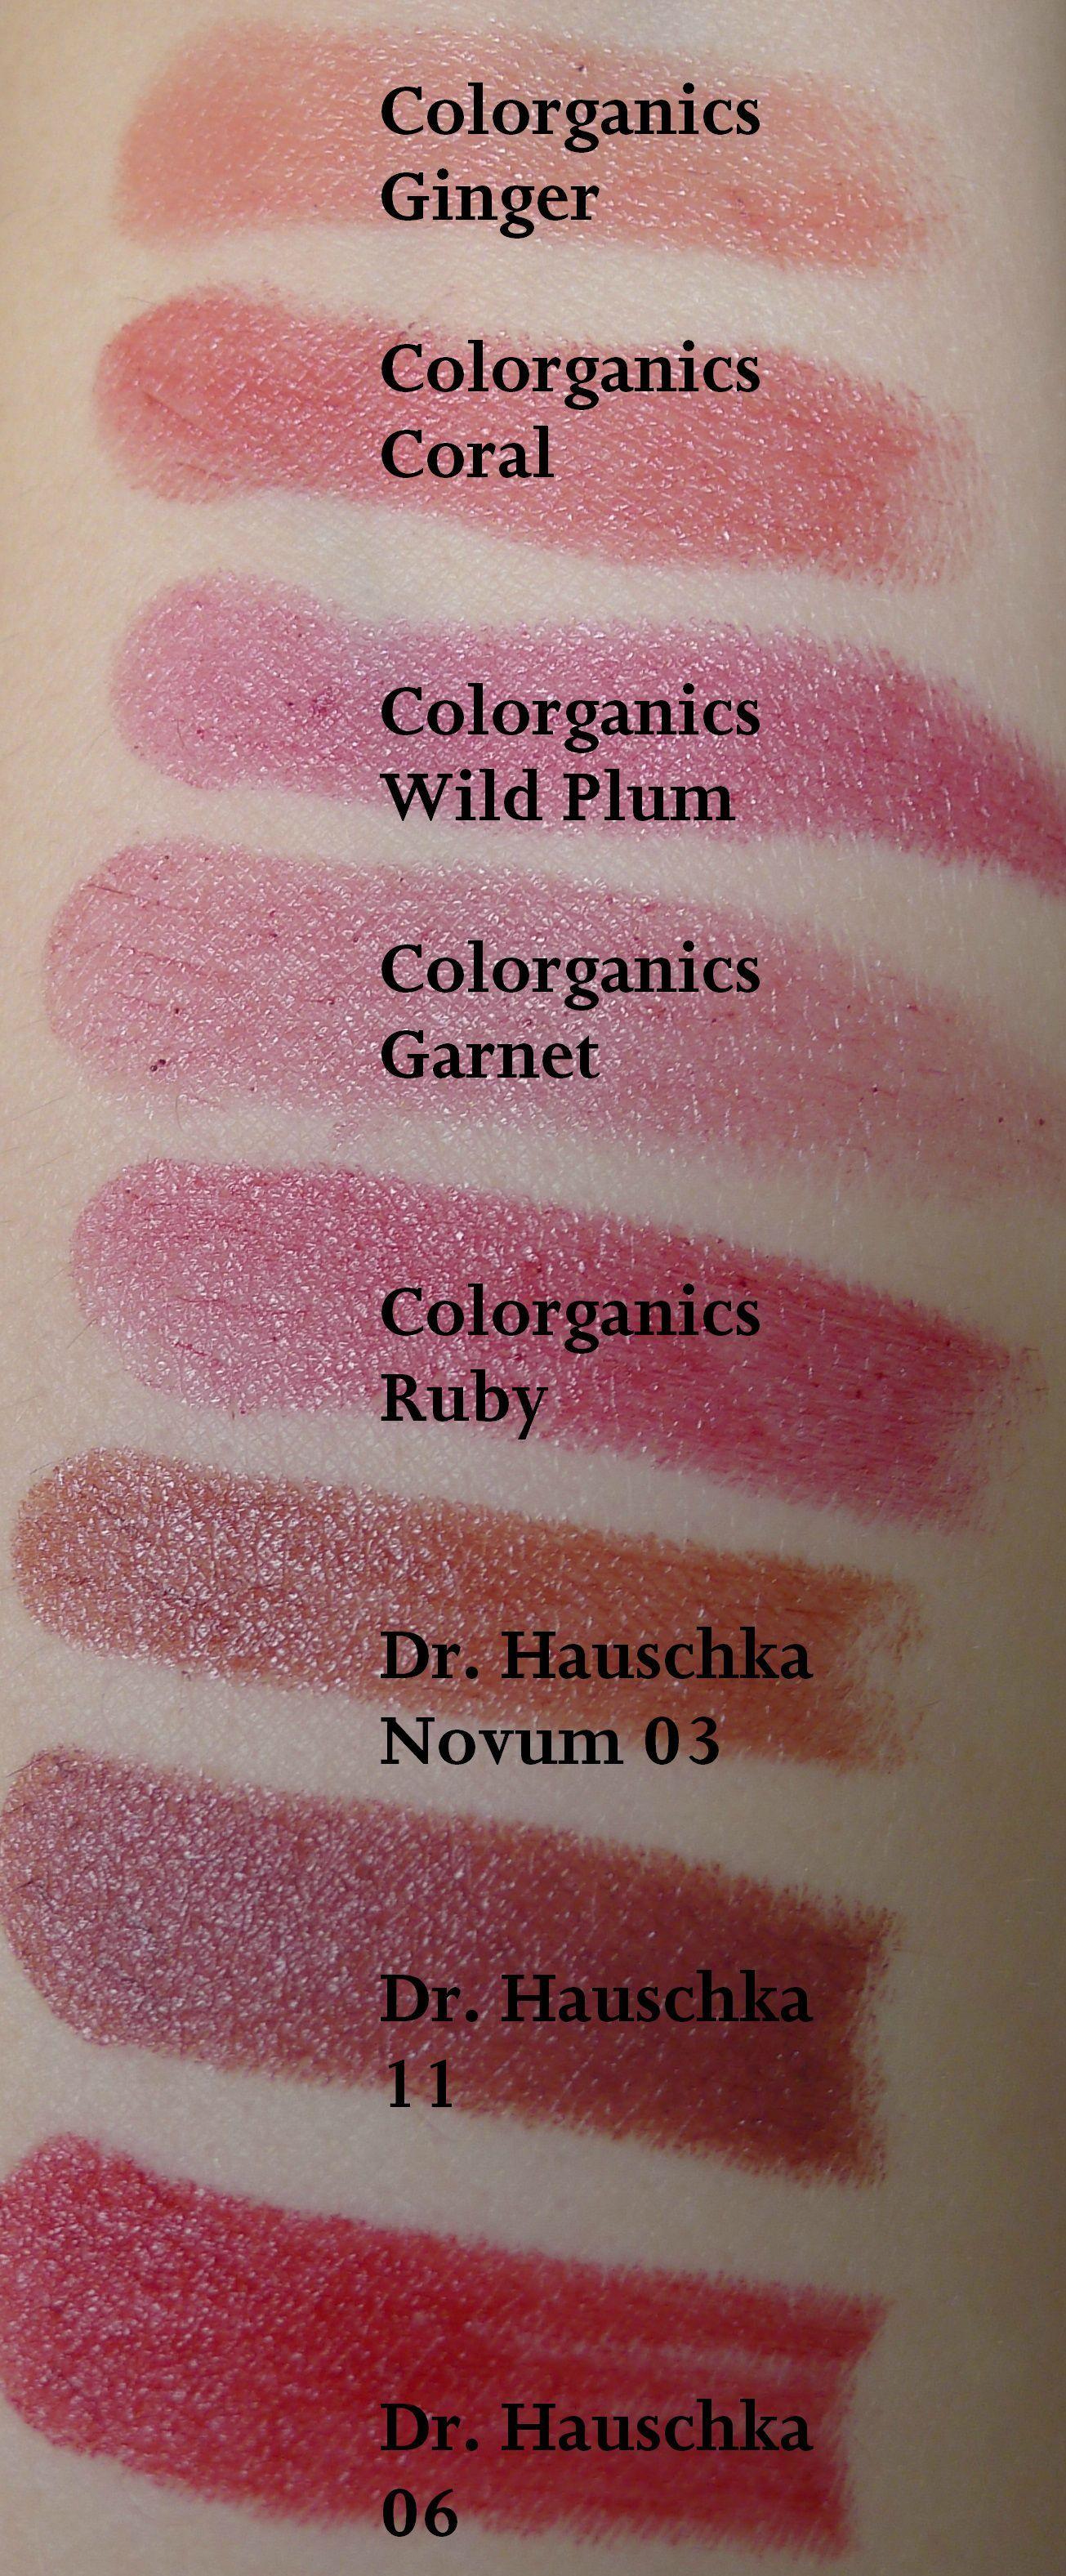 Hemporganics Colorganics And Dr Hauschka Swatches Crunchy Makeup Green Beauty Swatch